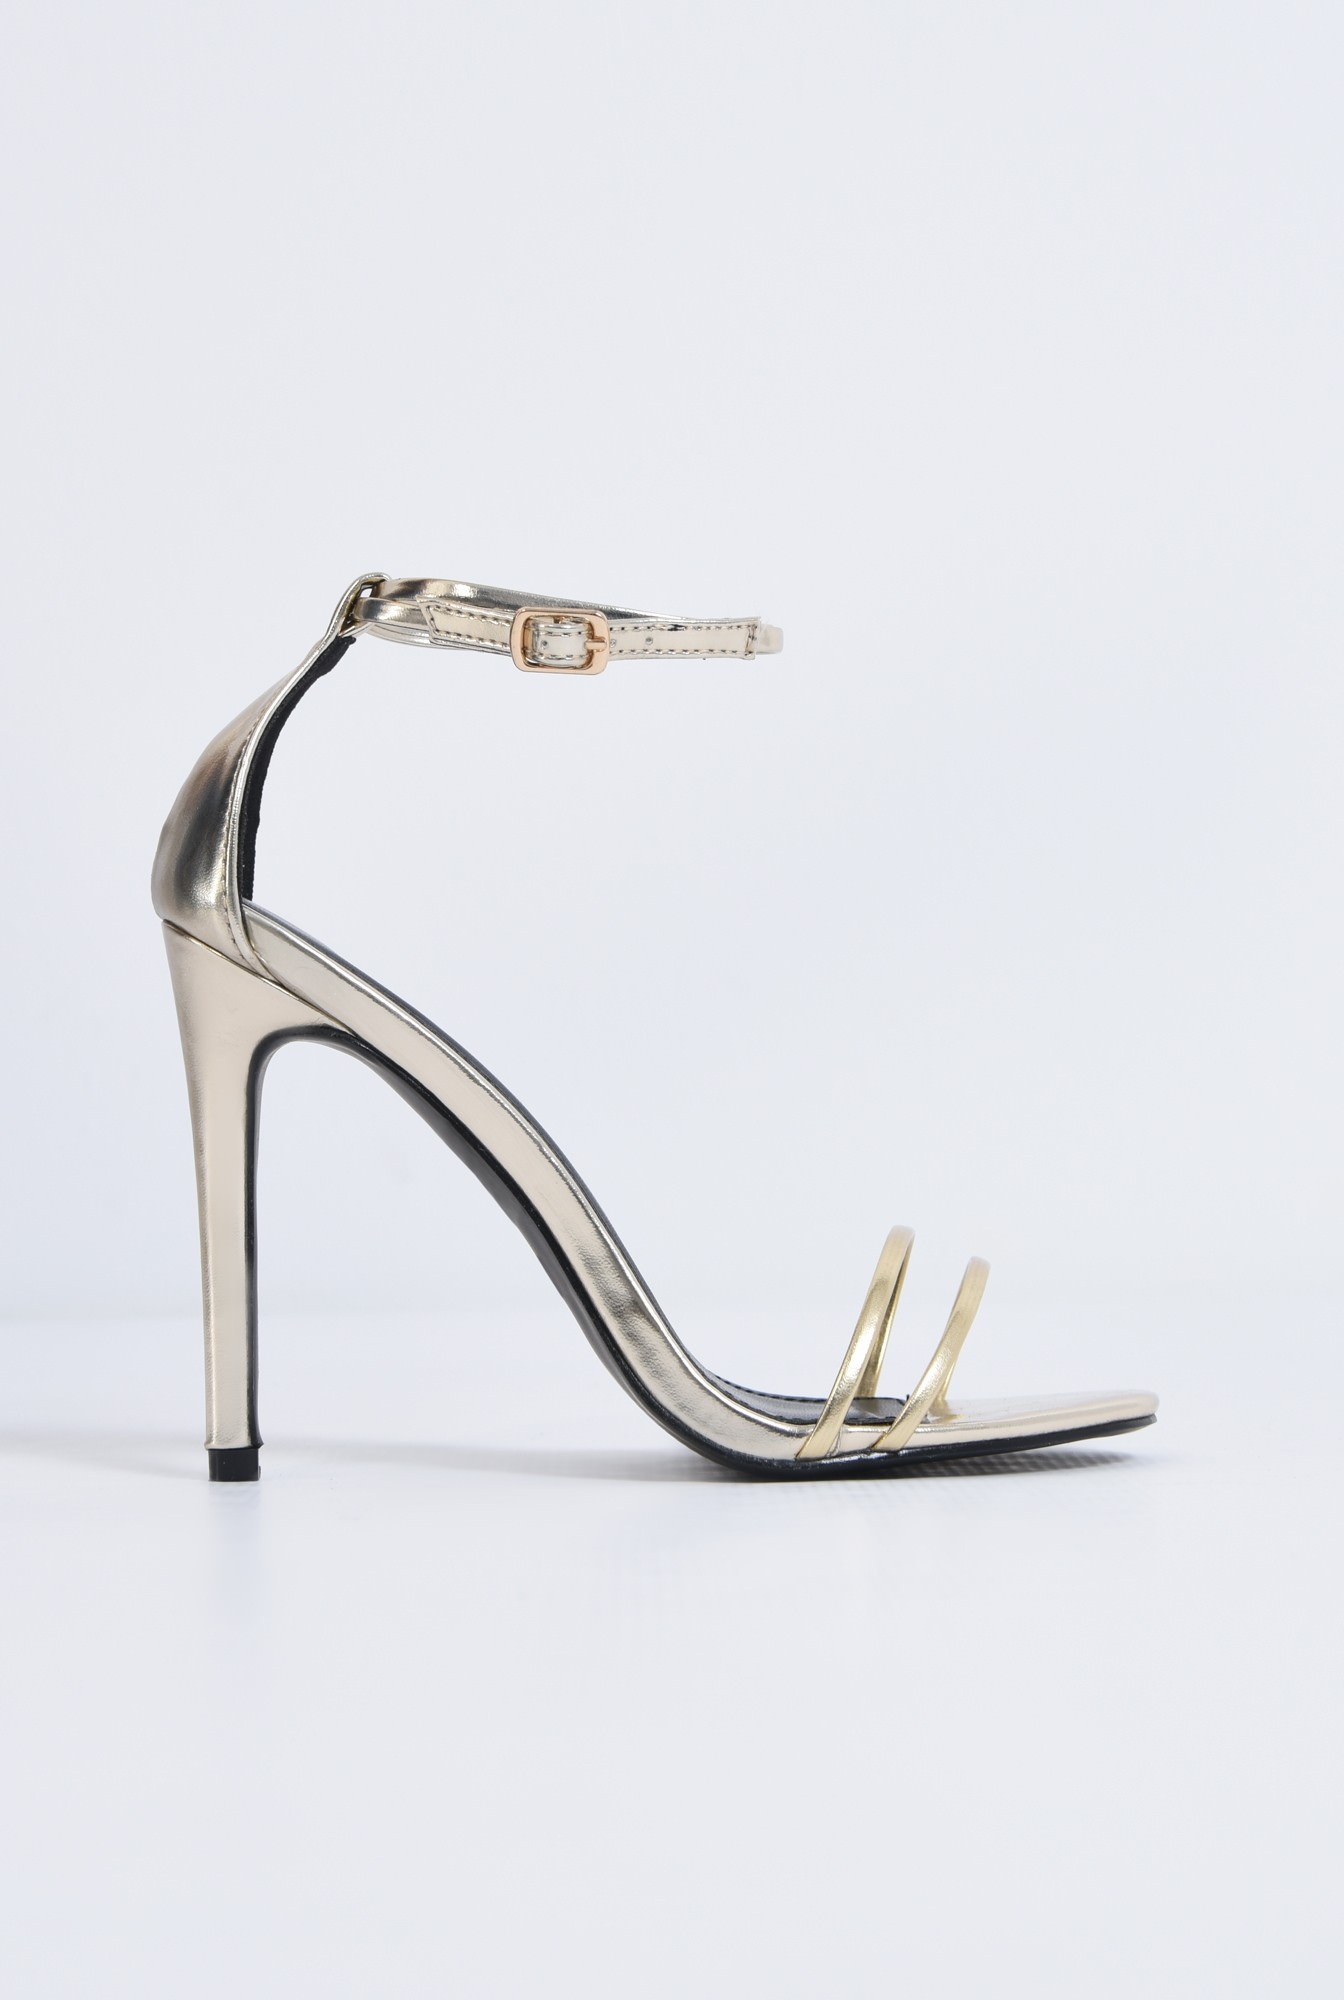 0 - sandale elegante, aurii, stiletto